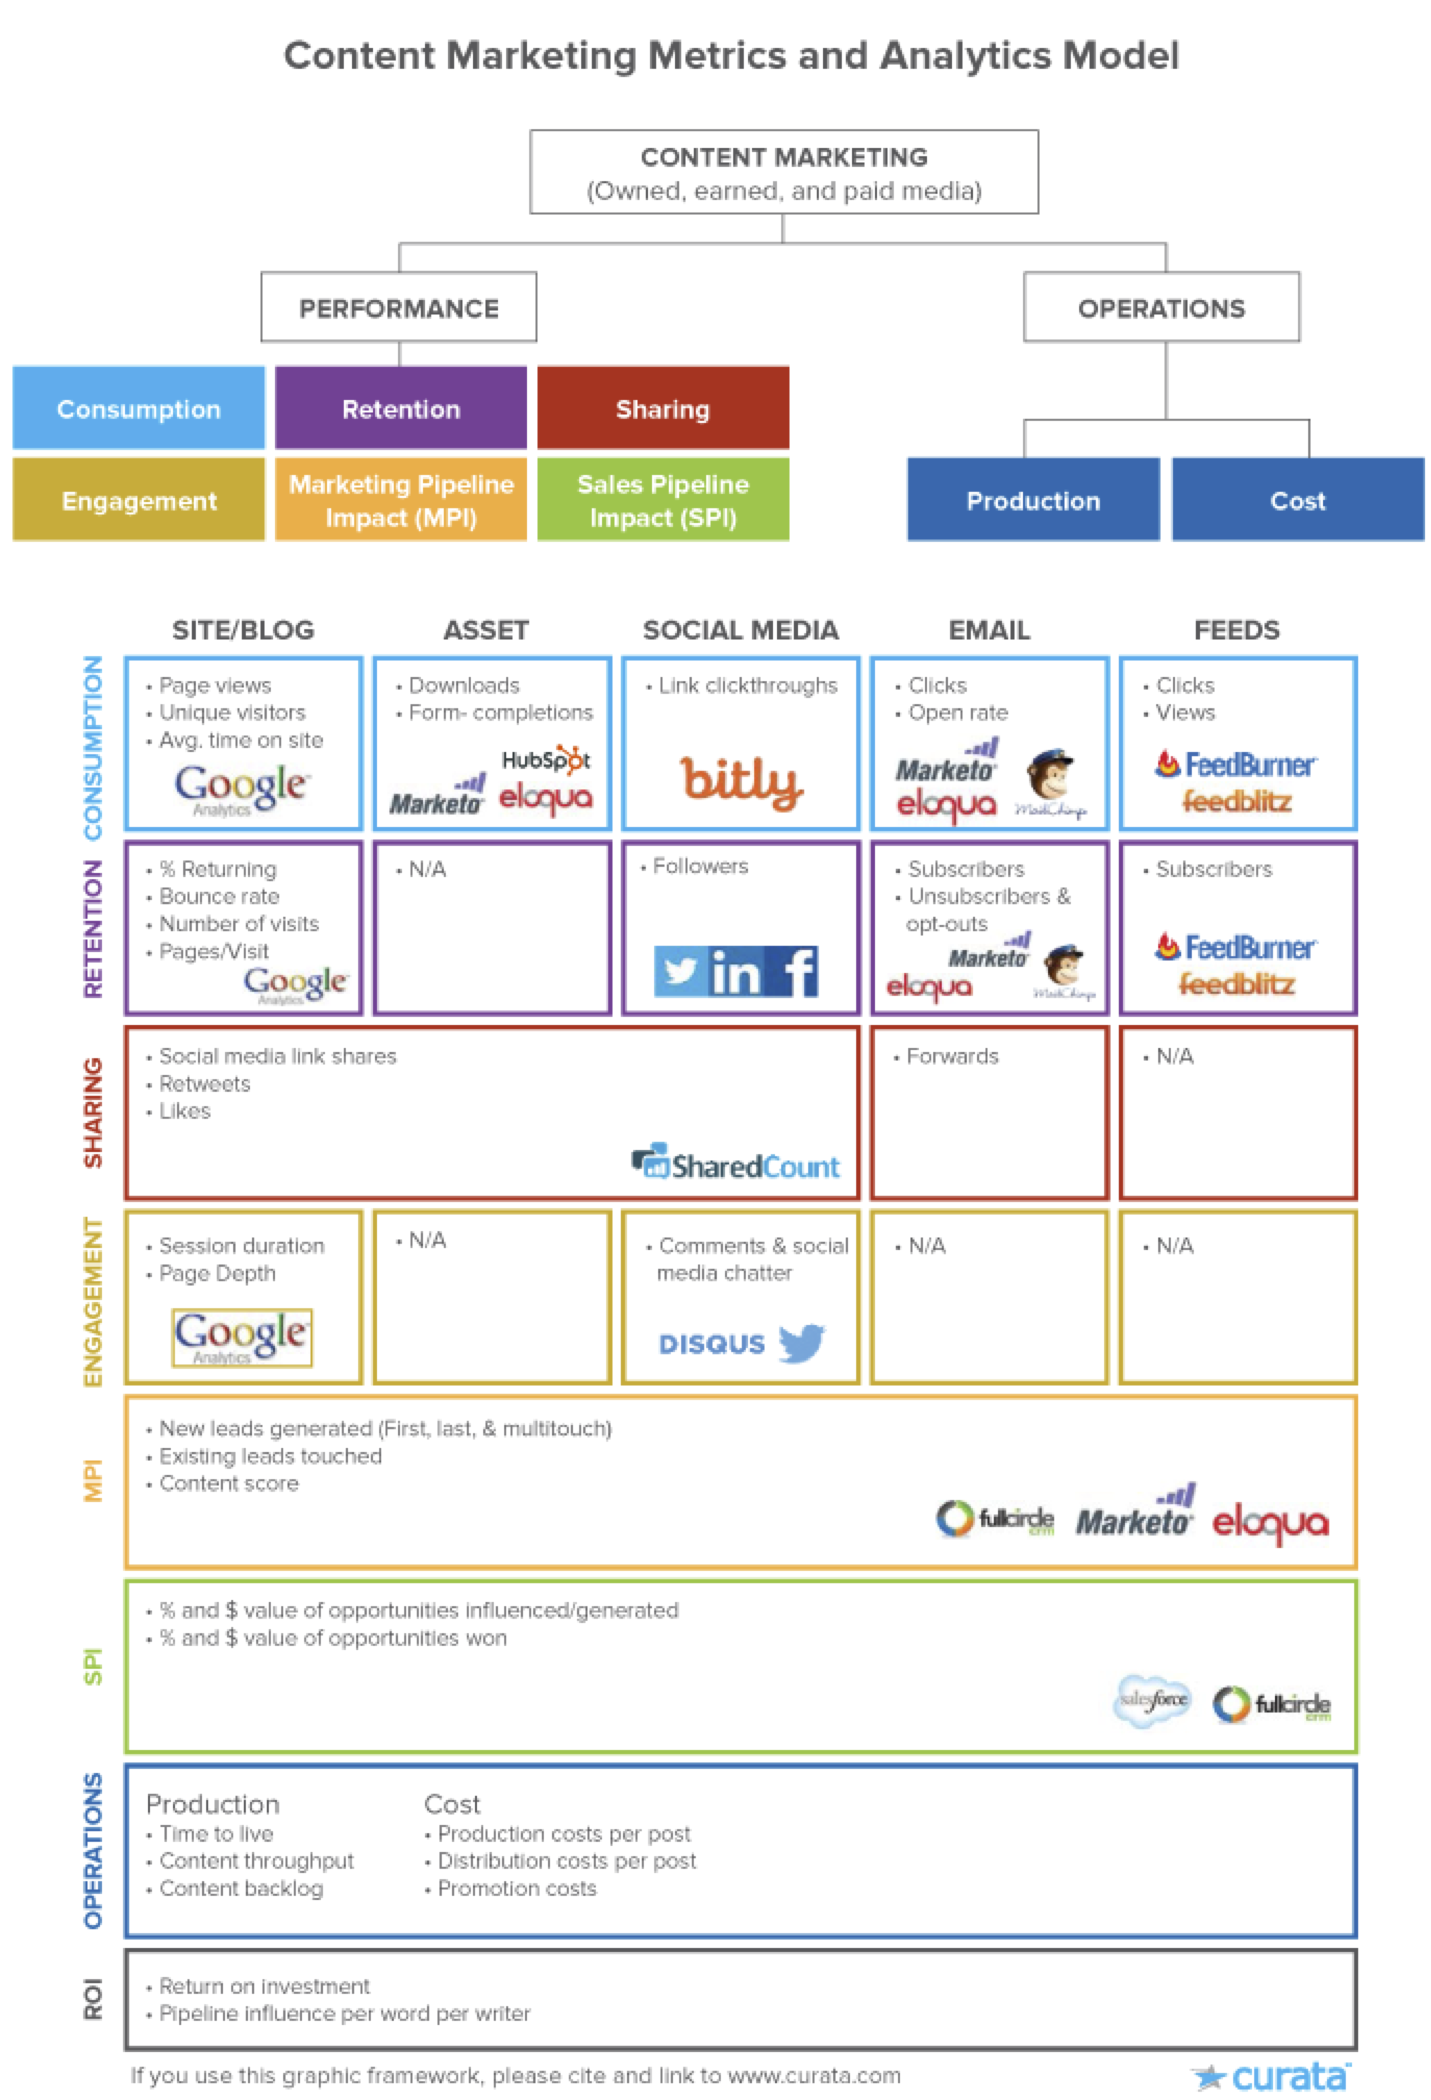 Content-Marketing-Metrics-and-Analytics-Model